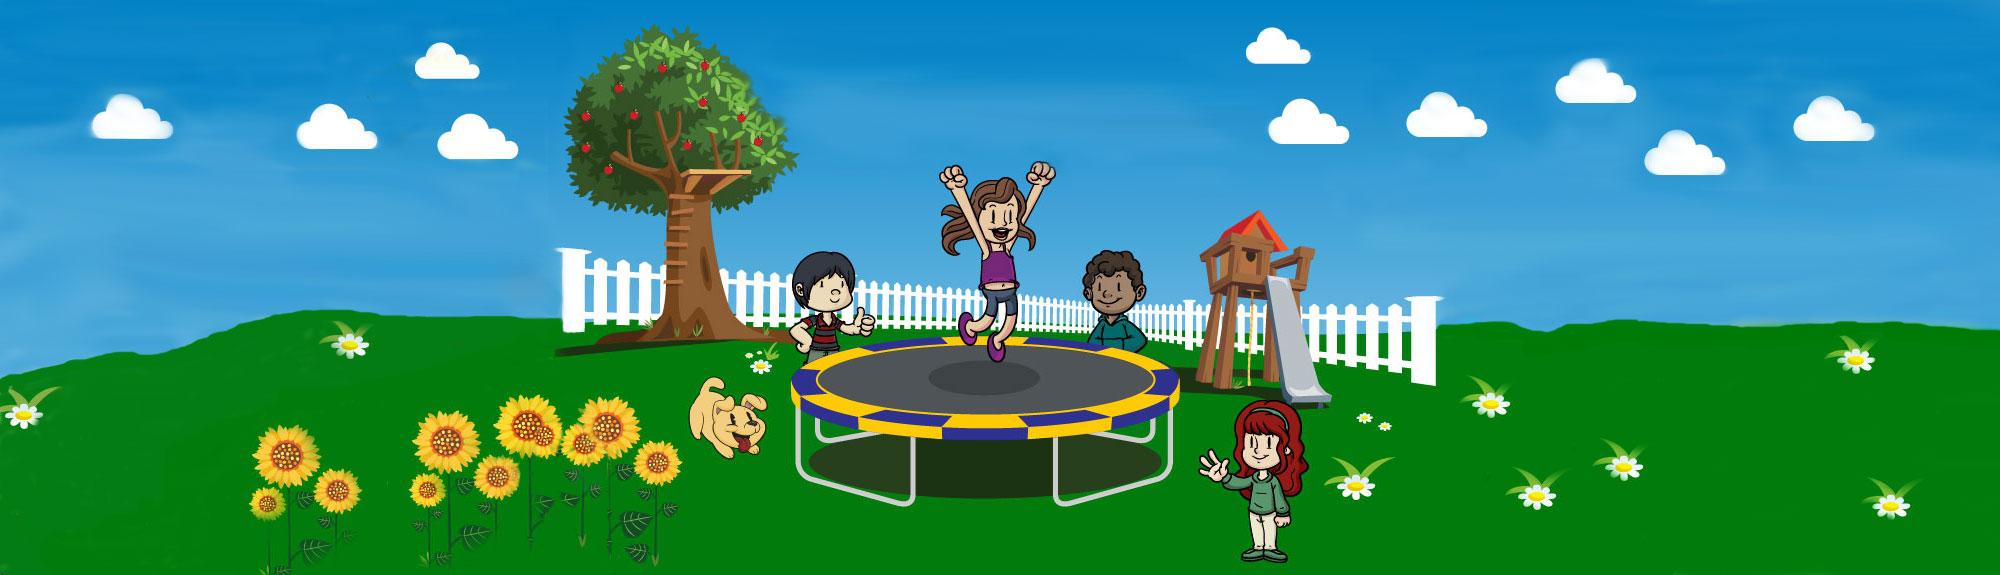 backyard scene with Best Trampolines: Vikan Trampolines